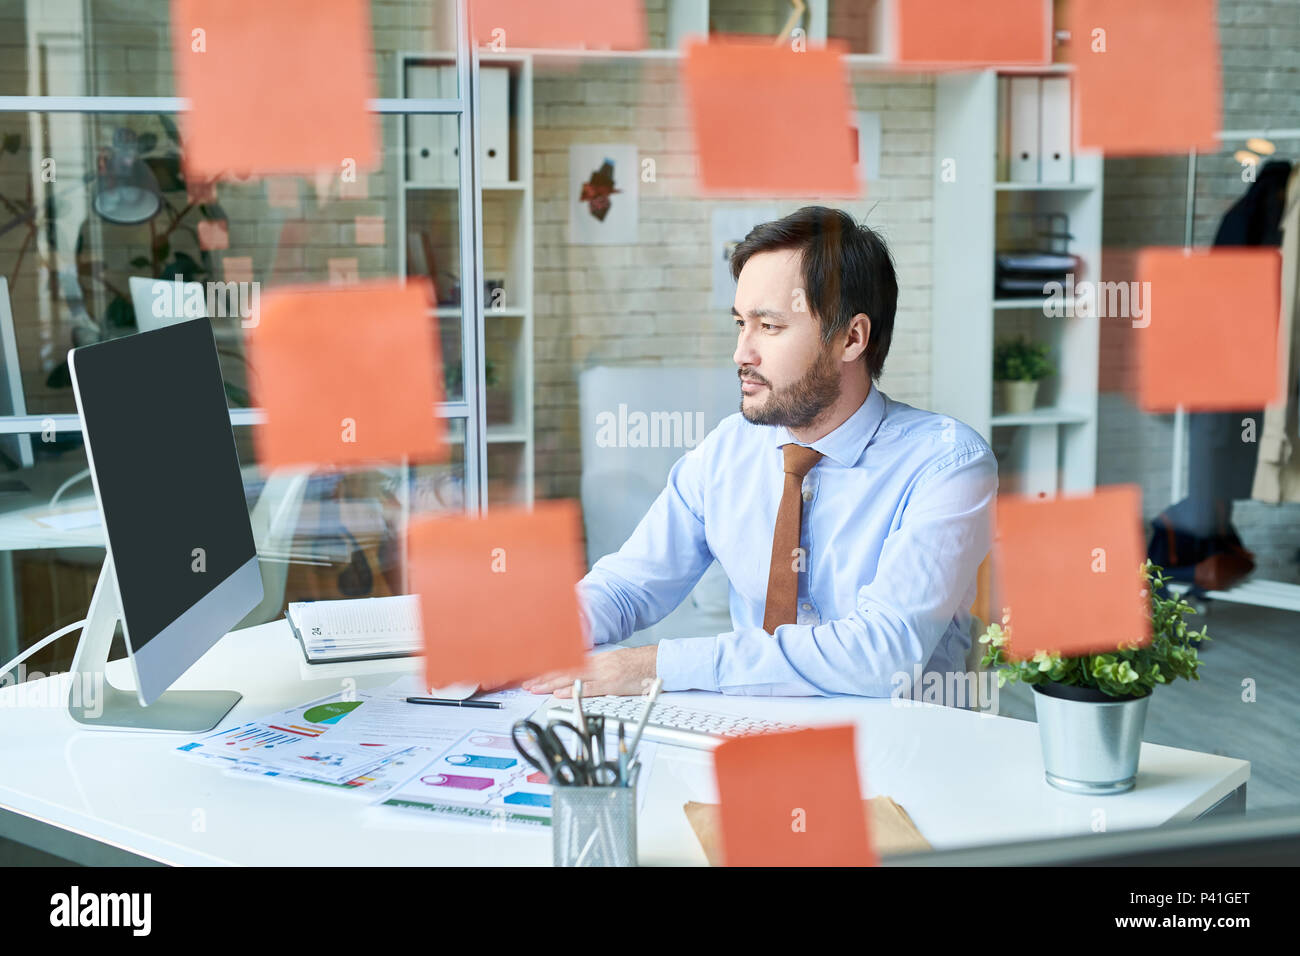 Man working in office derrière une vitre Photo Stock